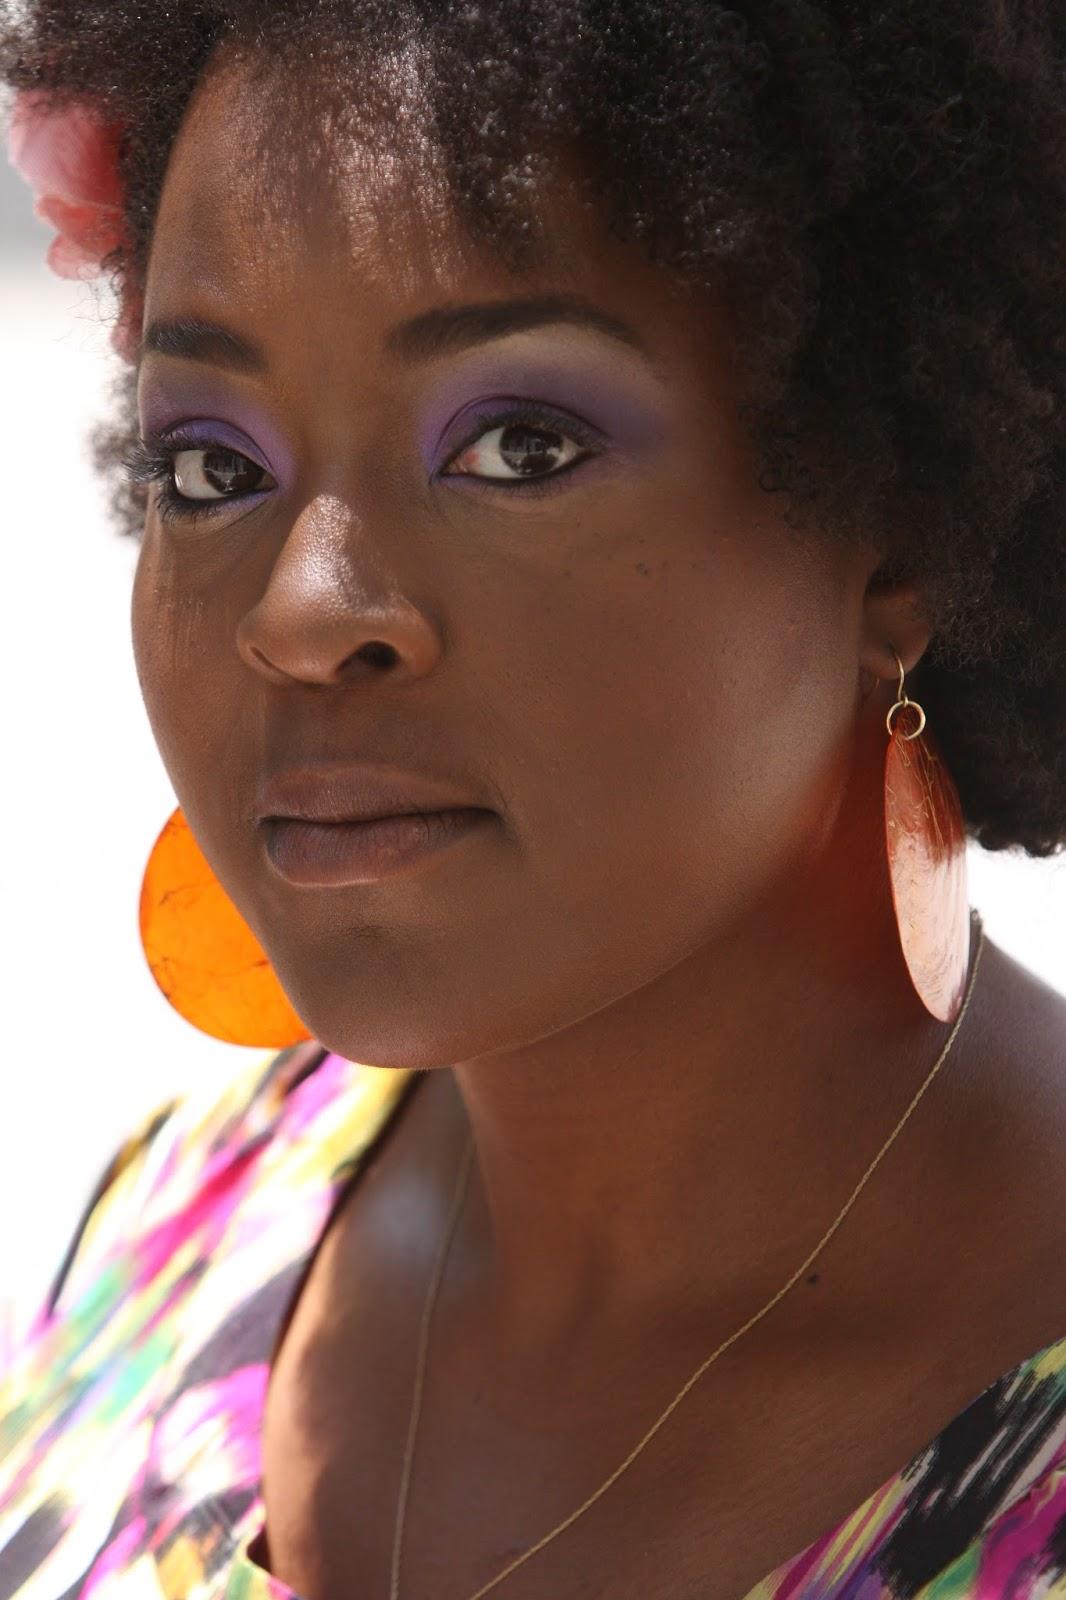 Rane revere Ebony